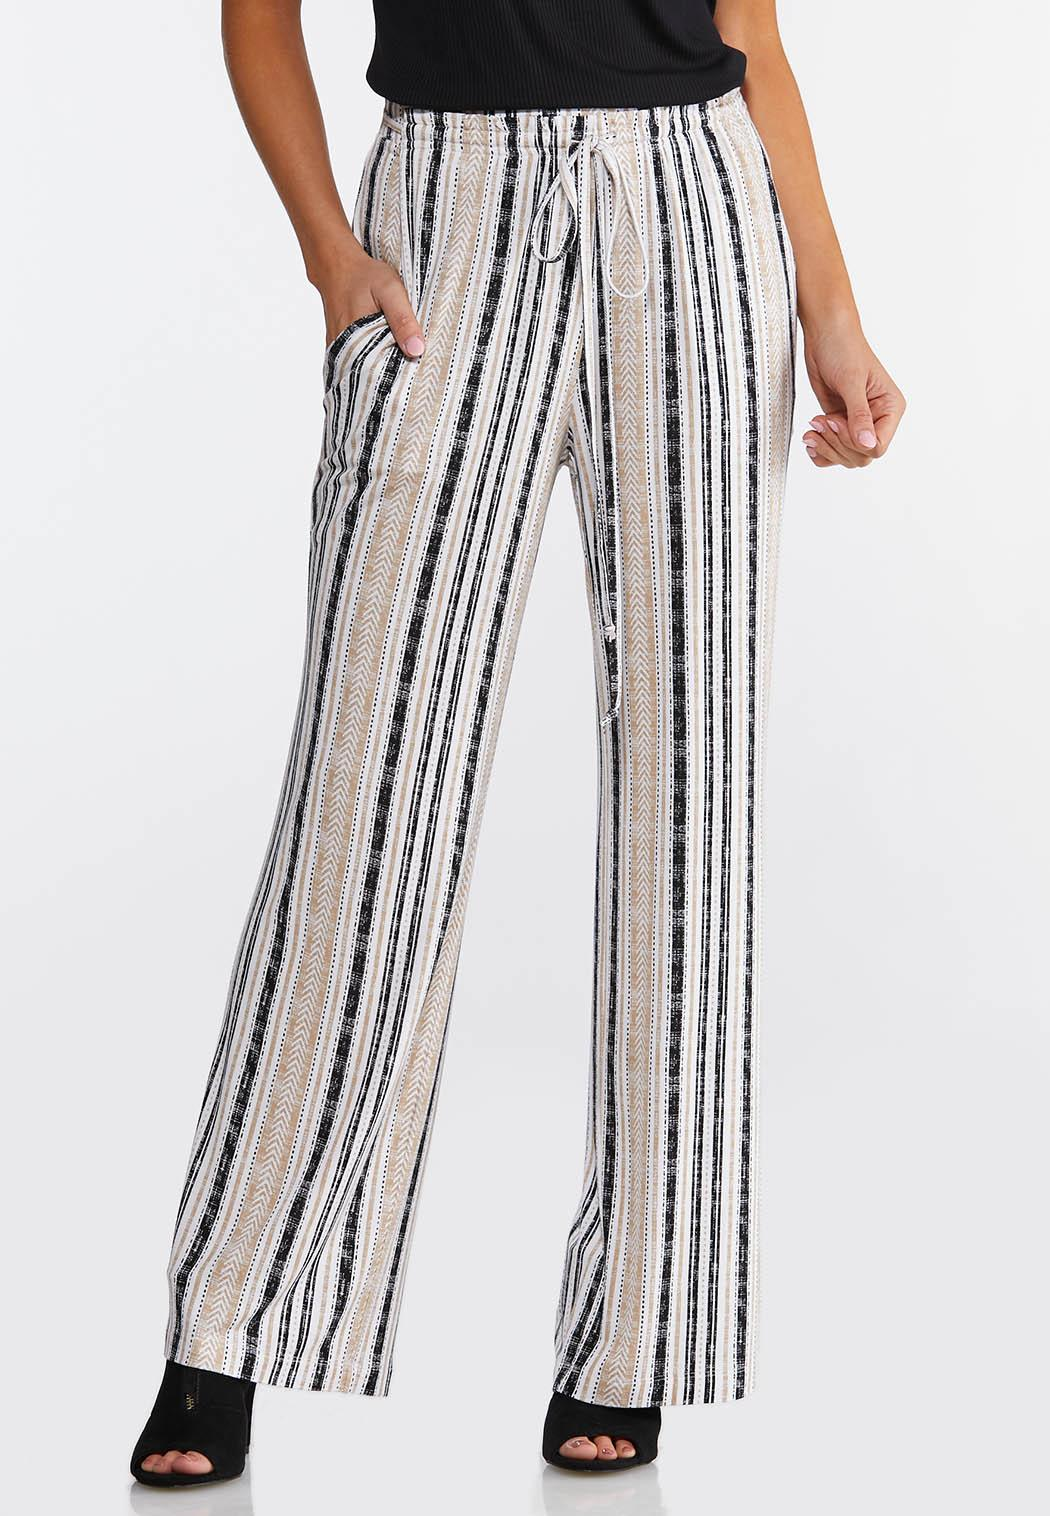 Neutral Striped Pants